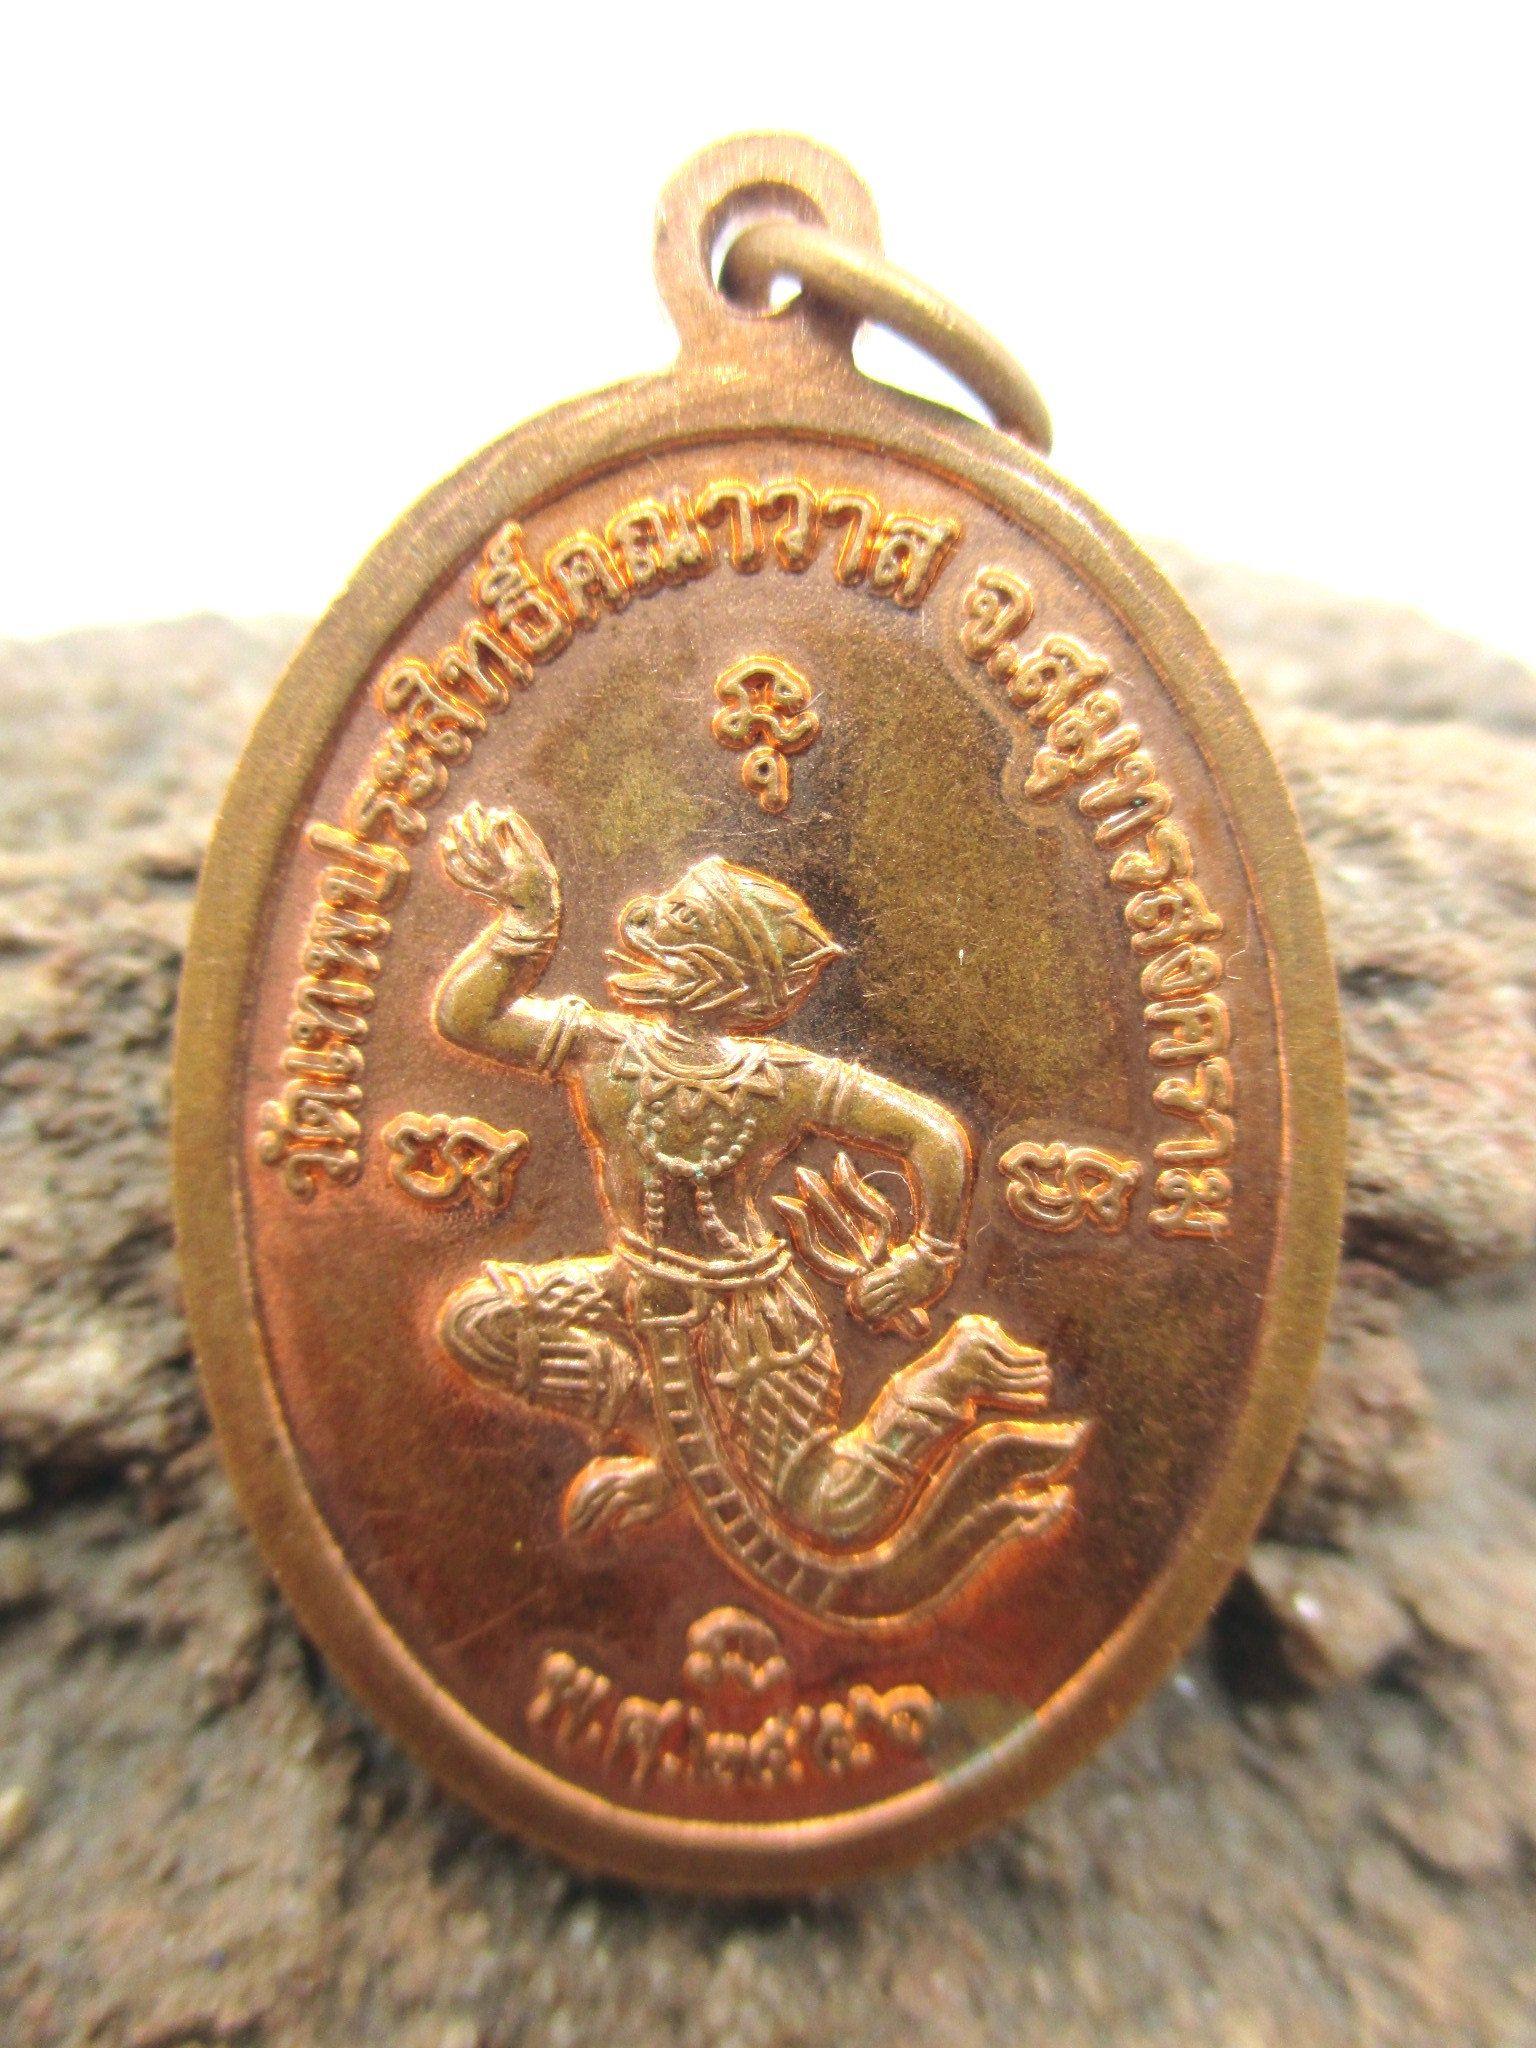 Rare 10 yrs Blessed Thai Hanuman,lord of monkey back Buddha with gemstone beads muay thai thai boxing  amulet pendant free paracord necklace